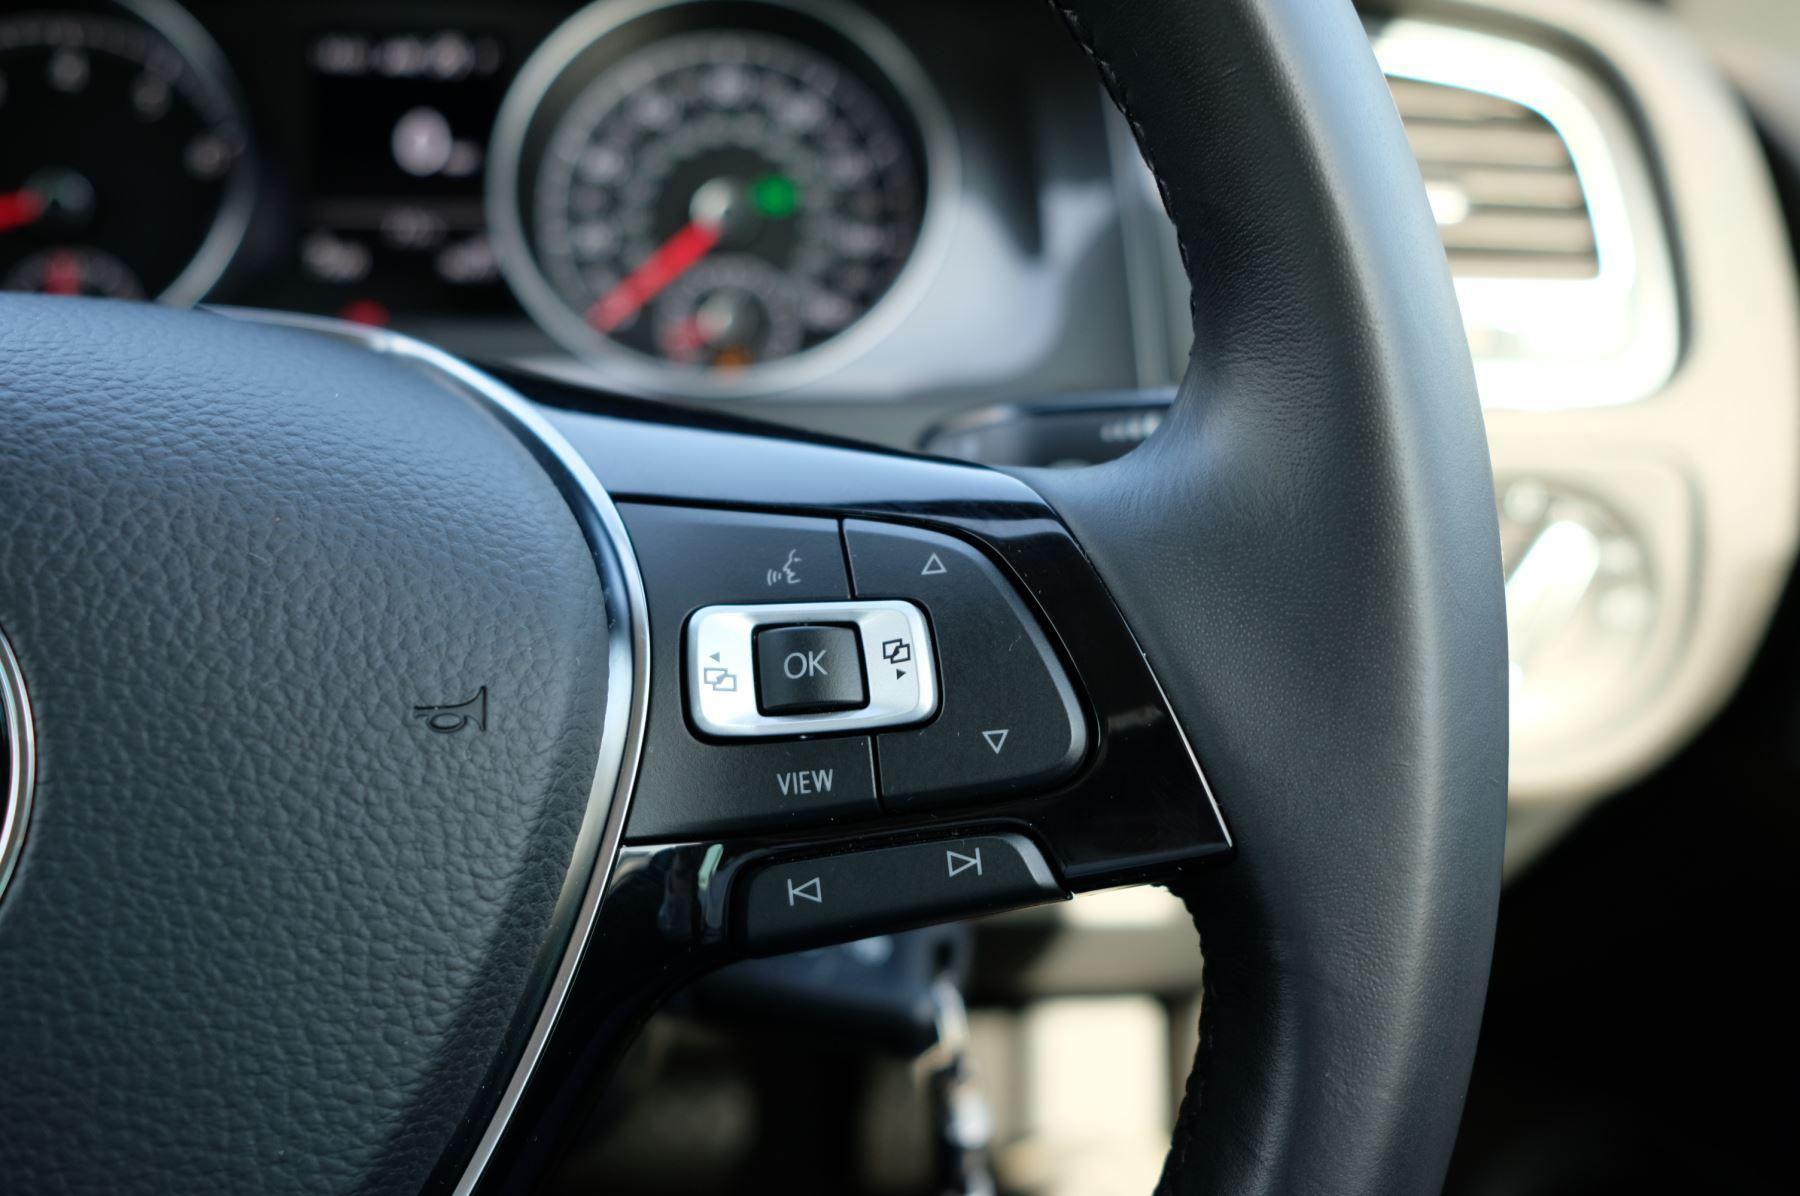 Volkswagen Golf 1.5 TSI EVO 150hp Match 5 Door DSG Auto with A/Con, Sat Nav, Alloys & Adaptive Cruise  image 24